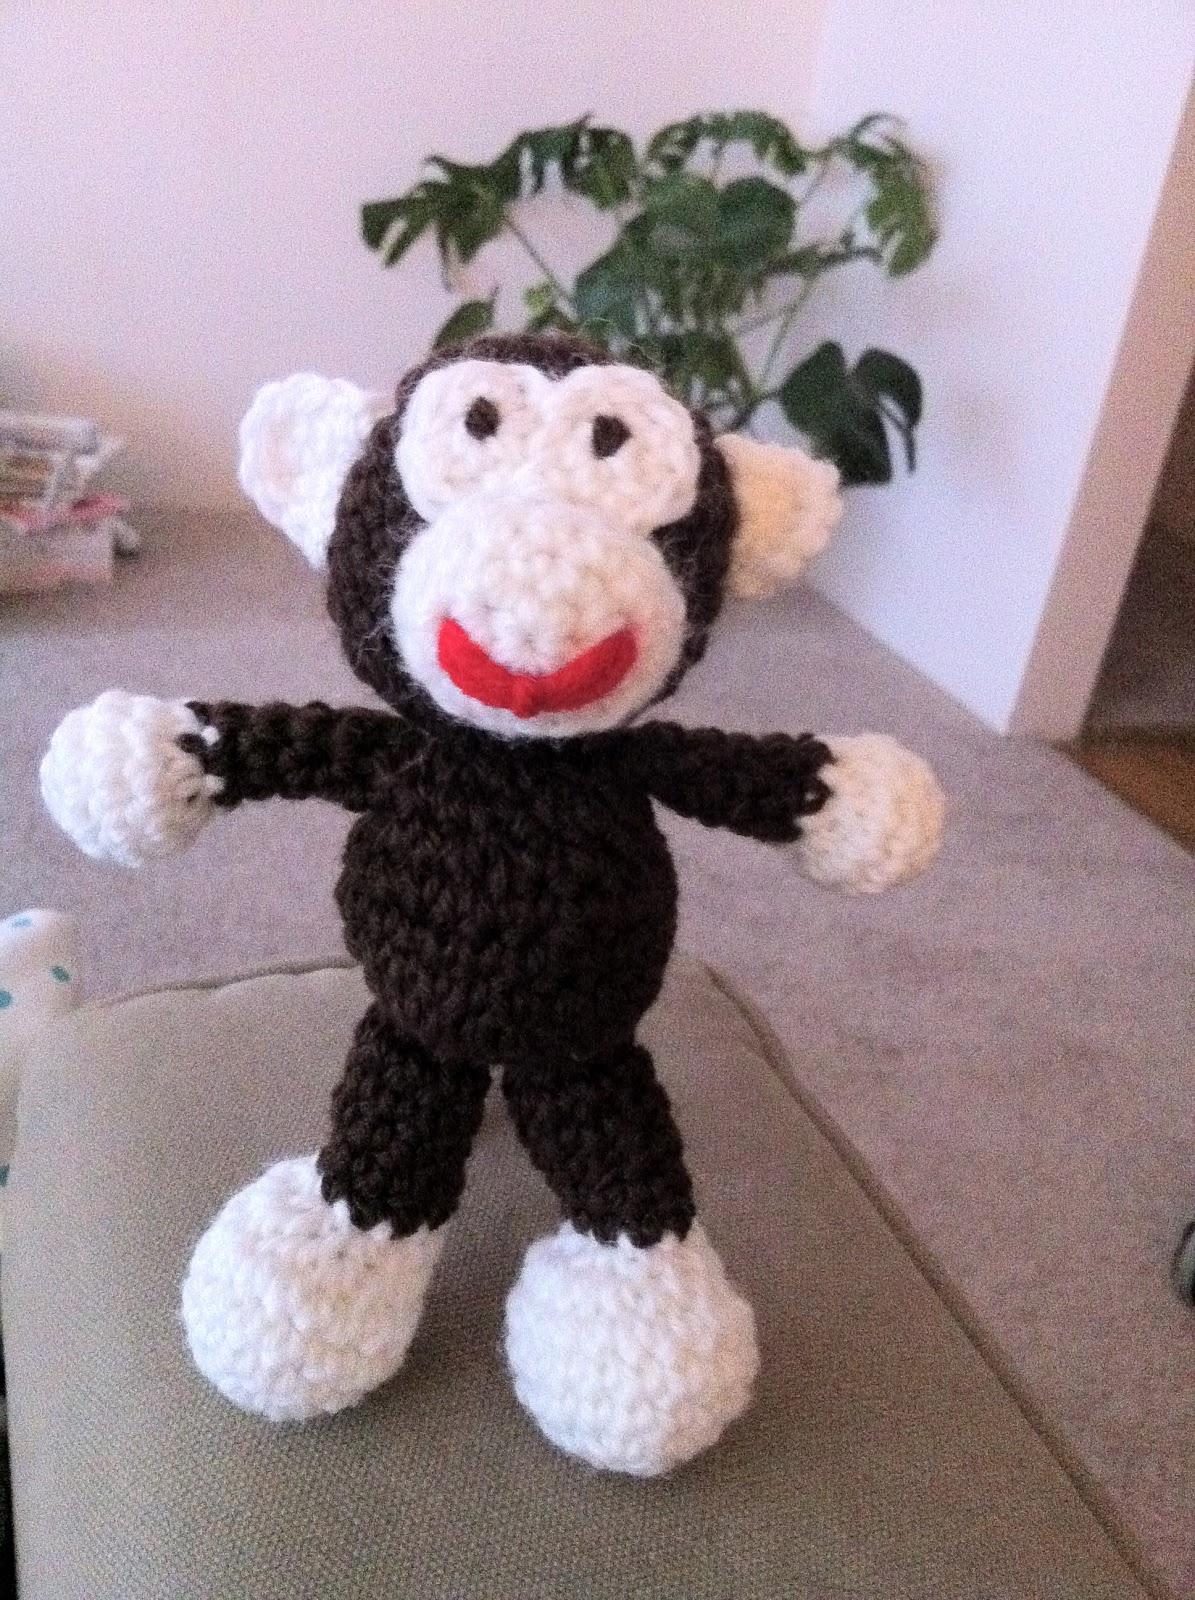 The Way I Crochet: Little Monkey Amigurumi